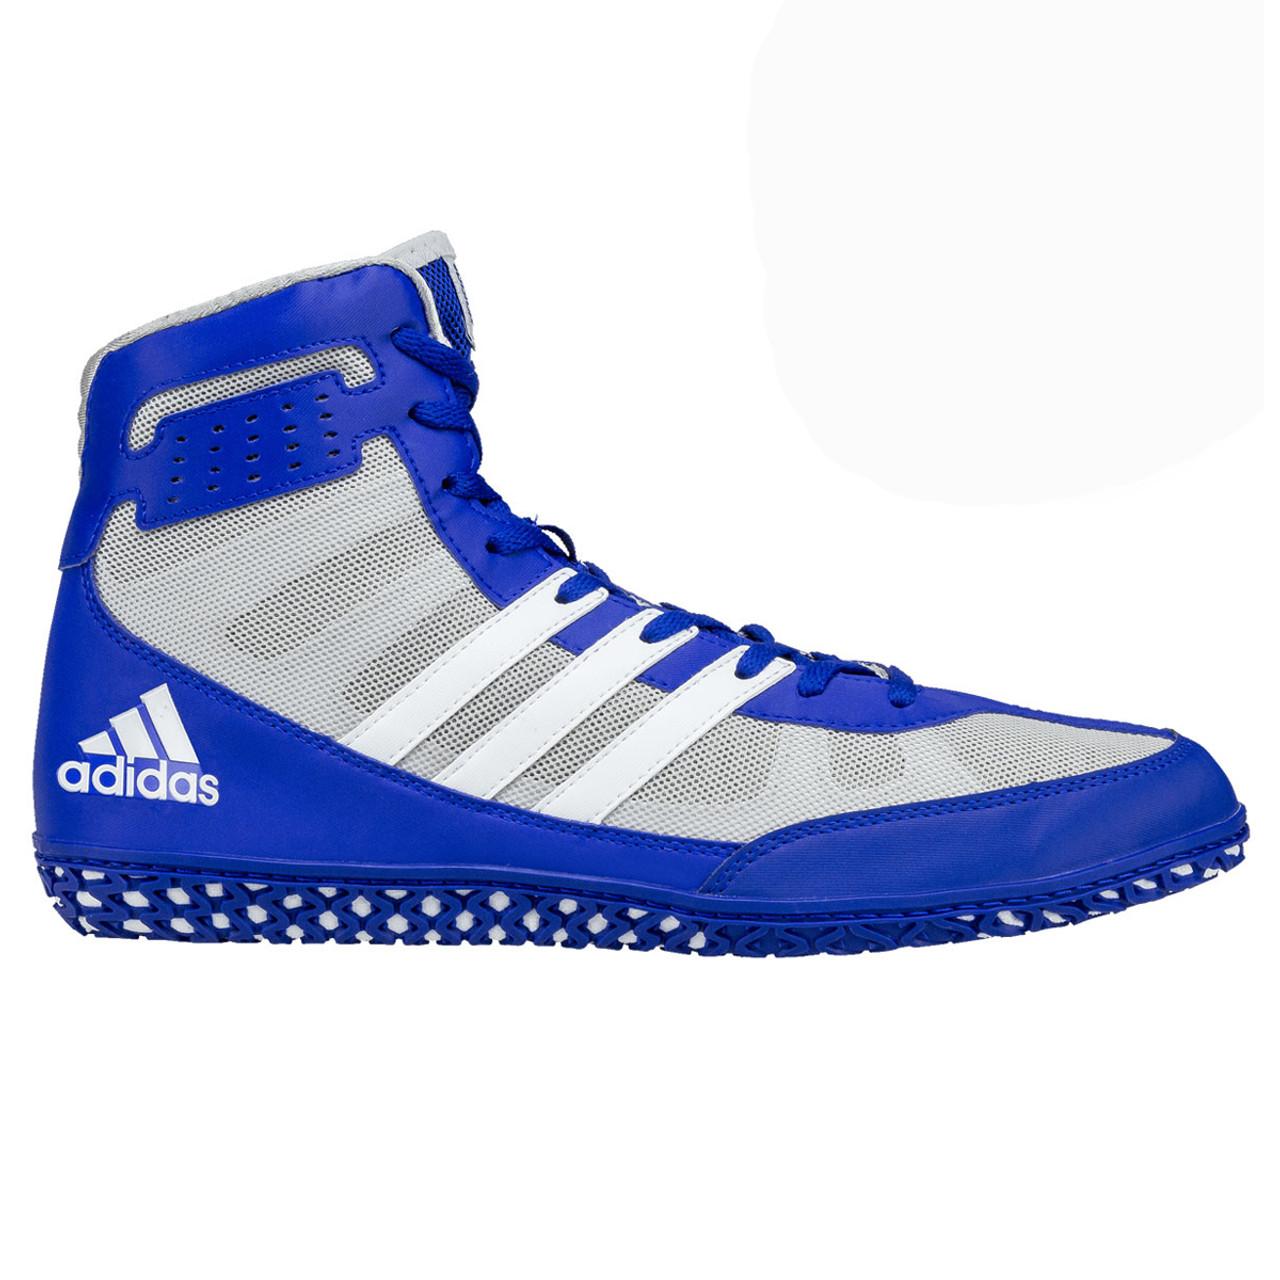 Adidas Mat Wizard 3 Adult Wrestling Shoes BB3296 - Royal, Gray